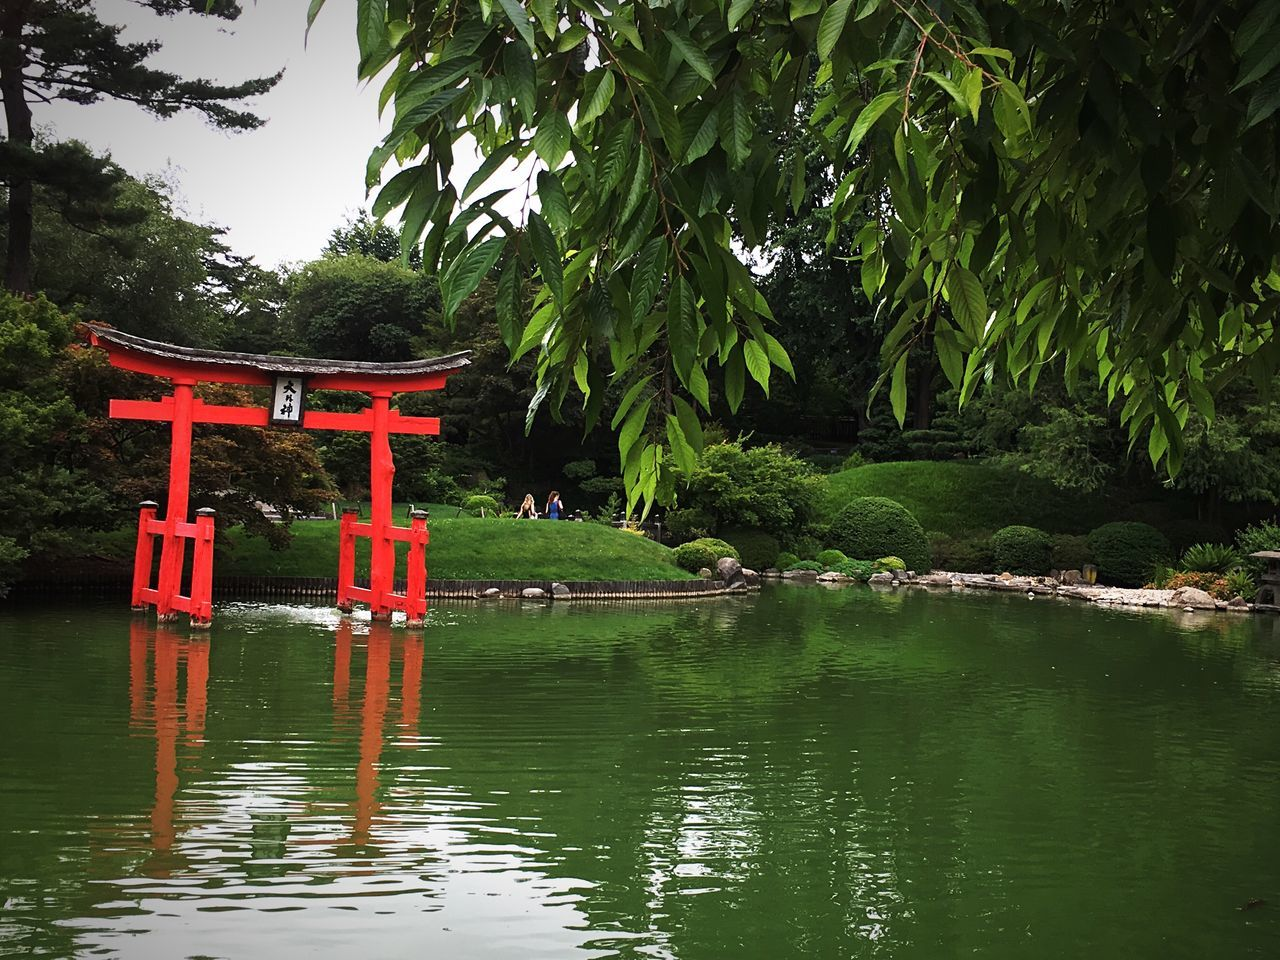 Japanese Garden Botanical Gardens Prospect Park Brooklyn New York City Green Tranquility Urban Escape Hidden Gem Pond Garden Park